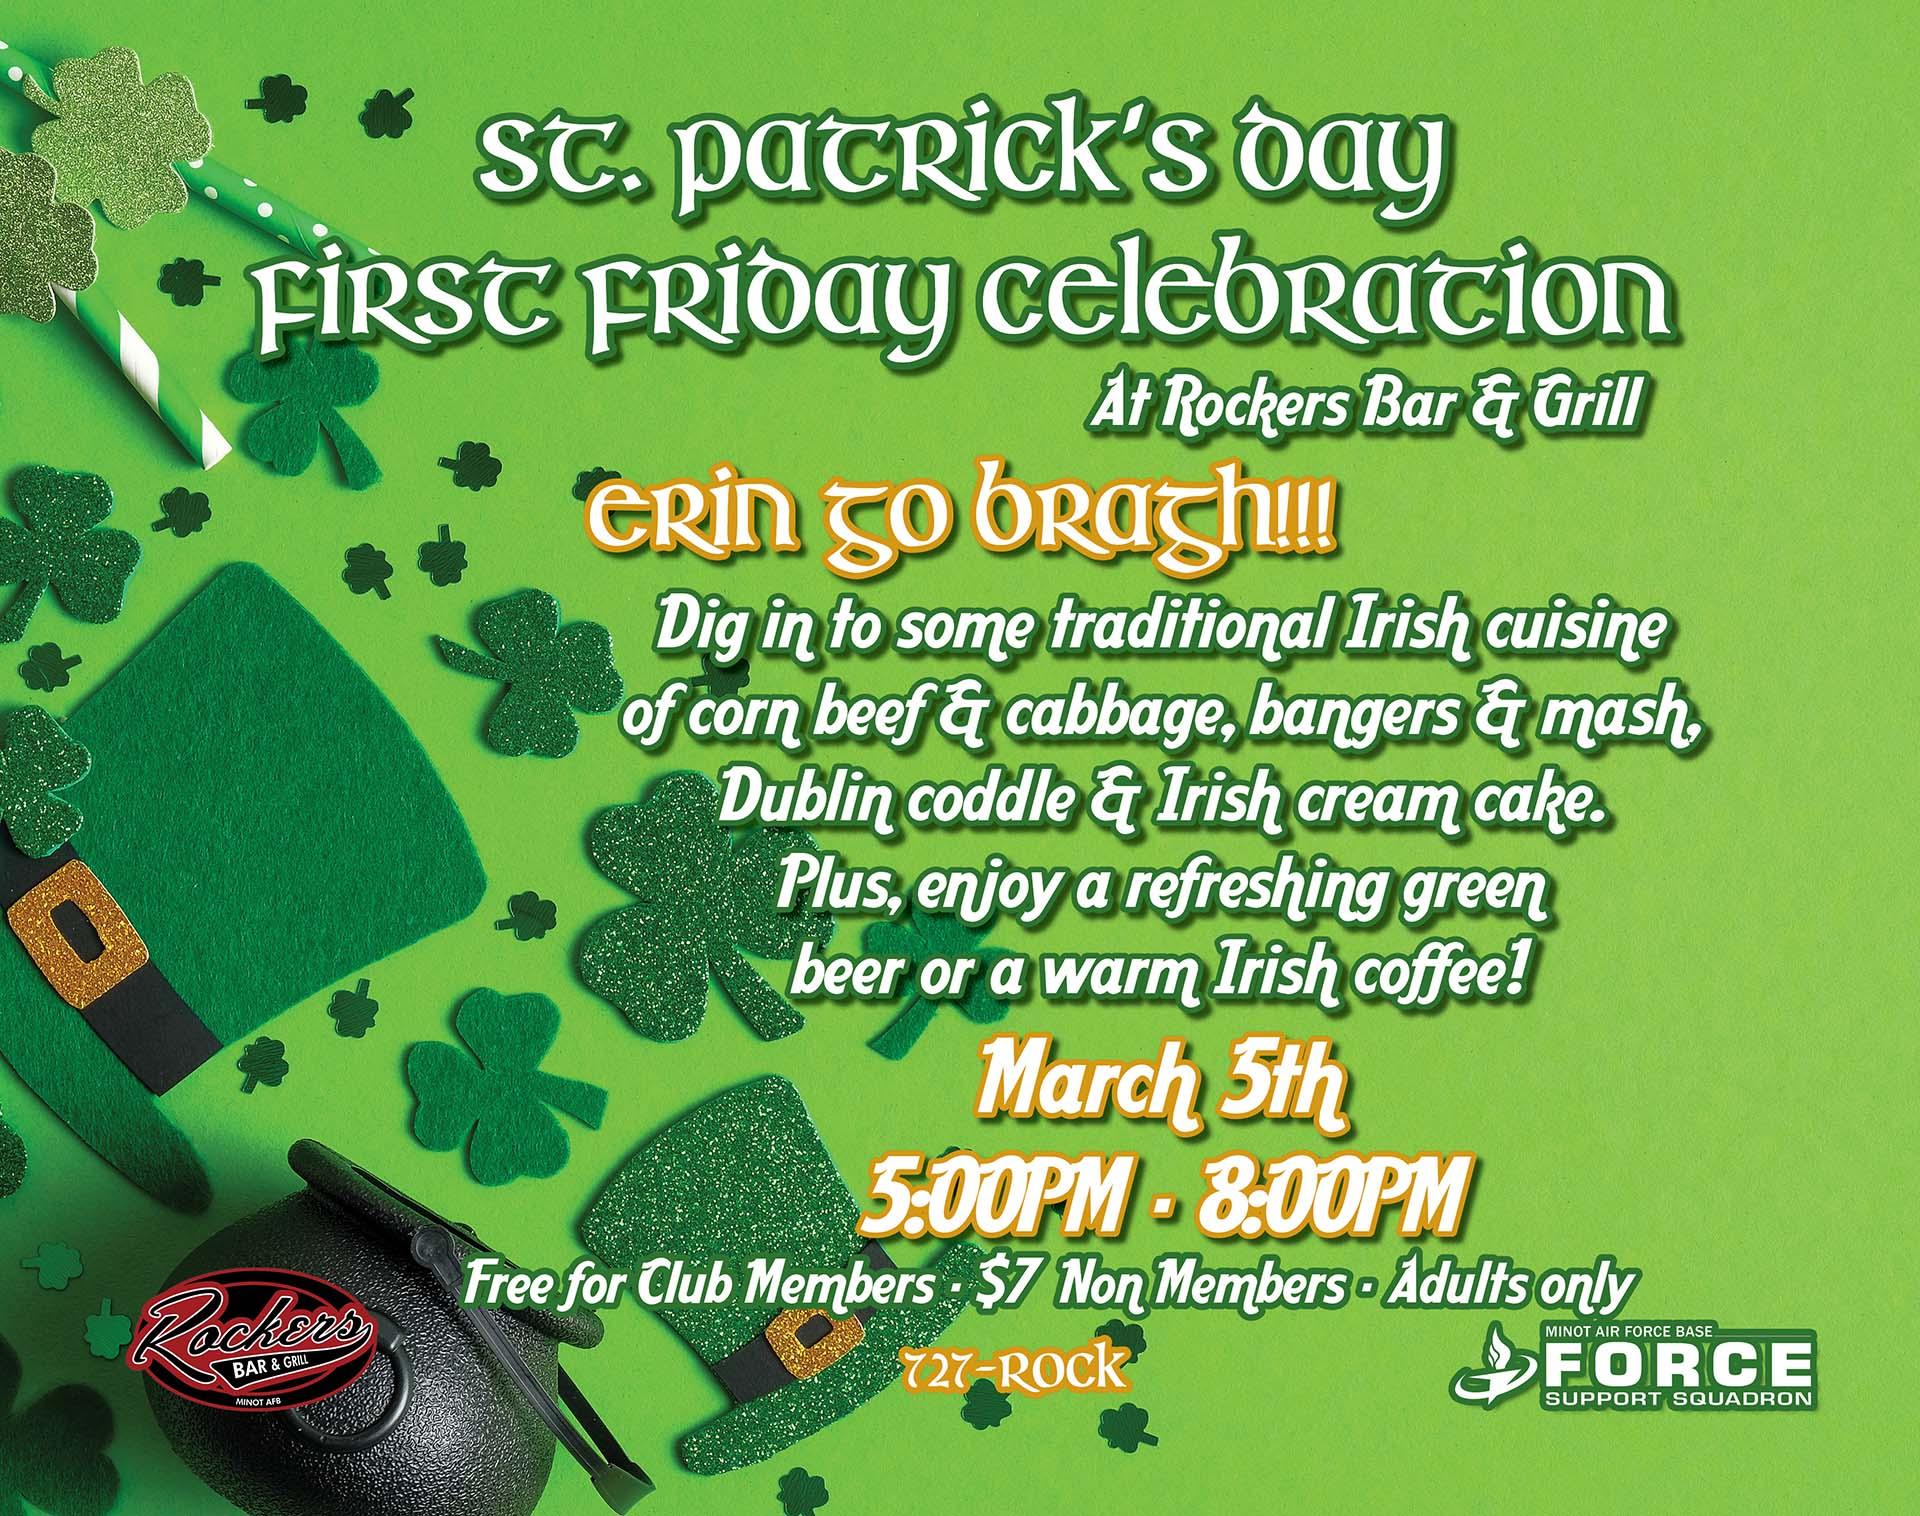 03.05 First Friday St. Patricks Day